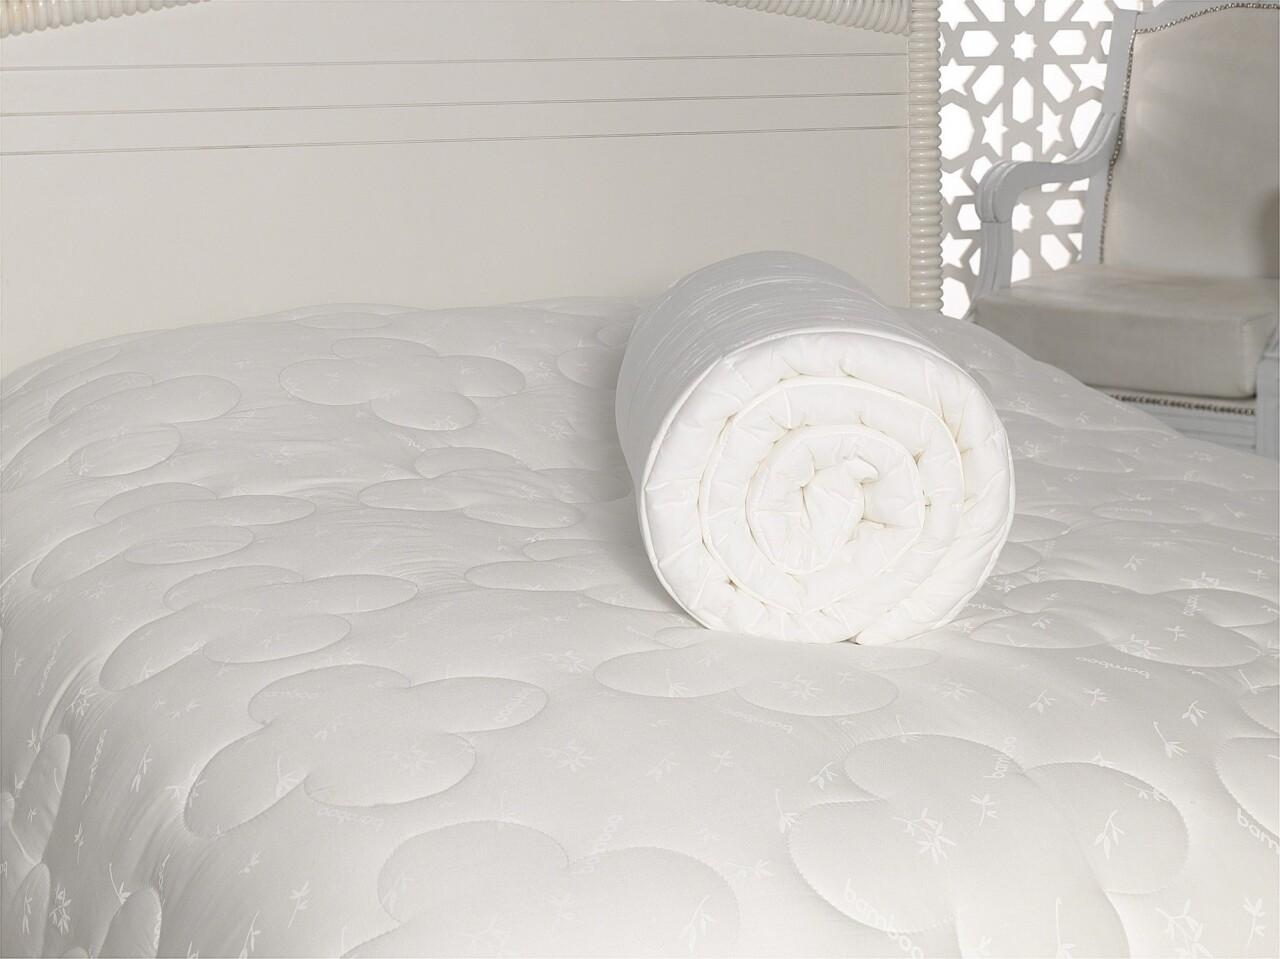 Patura pentru pat dublu din bumbac si acrylic, 155x215 cm, Cotton Box, alb